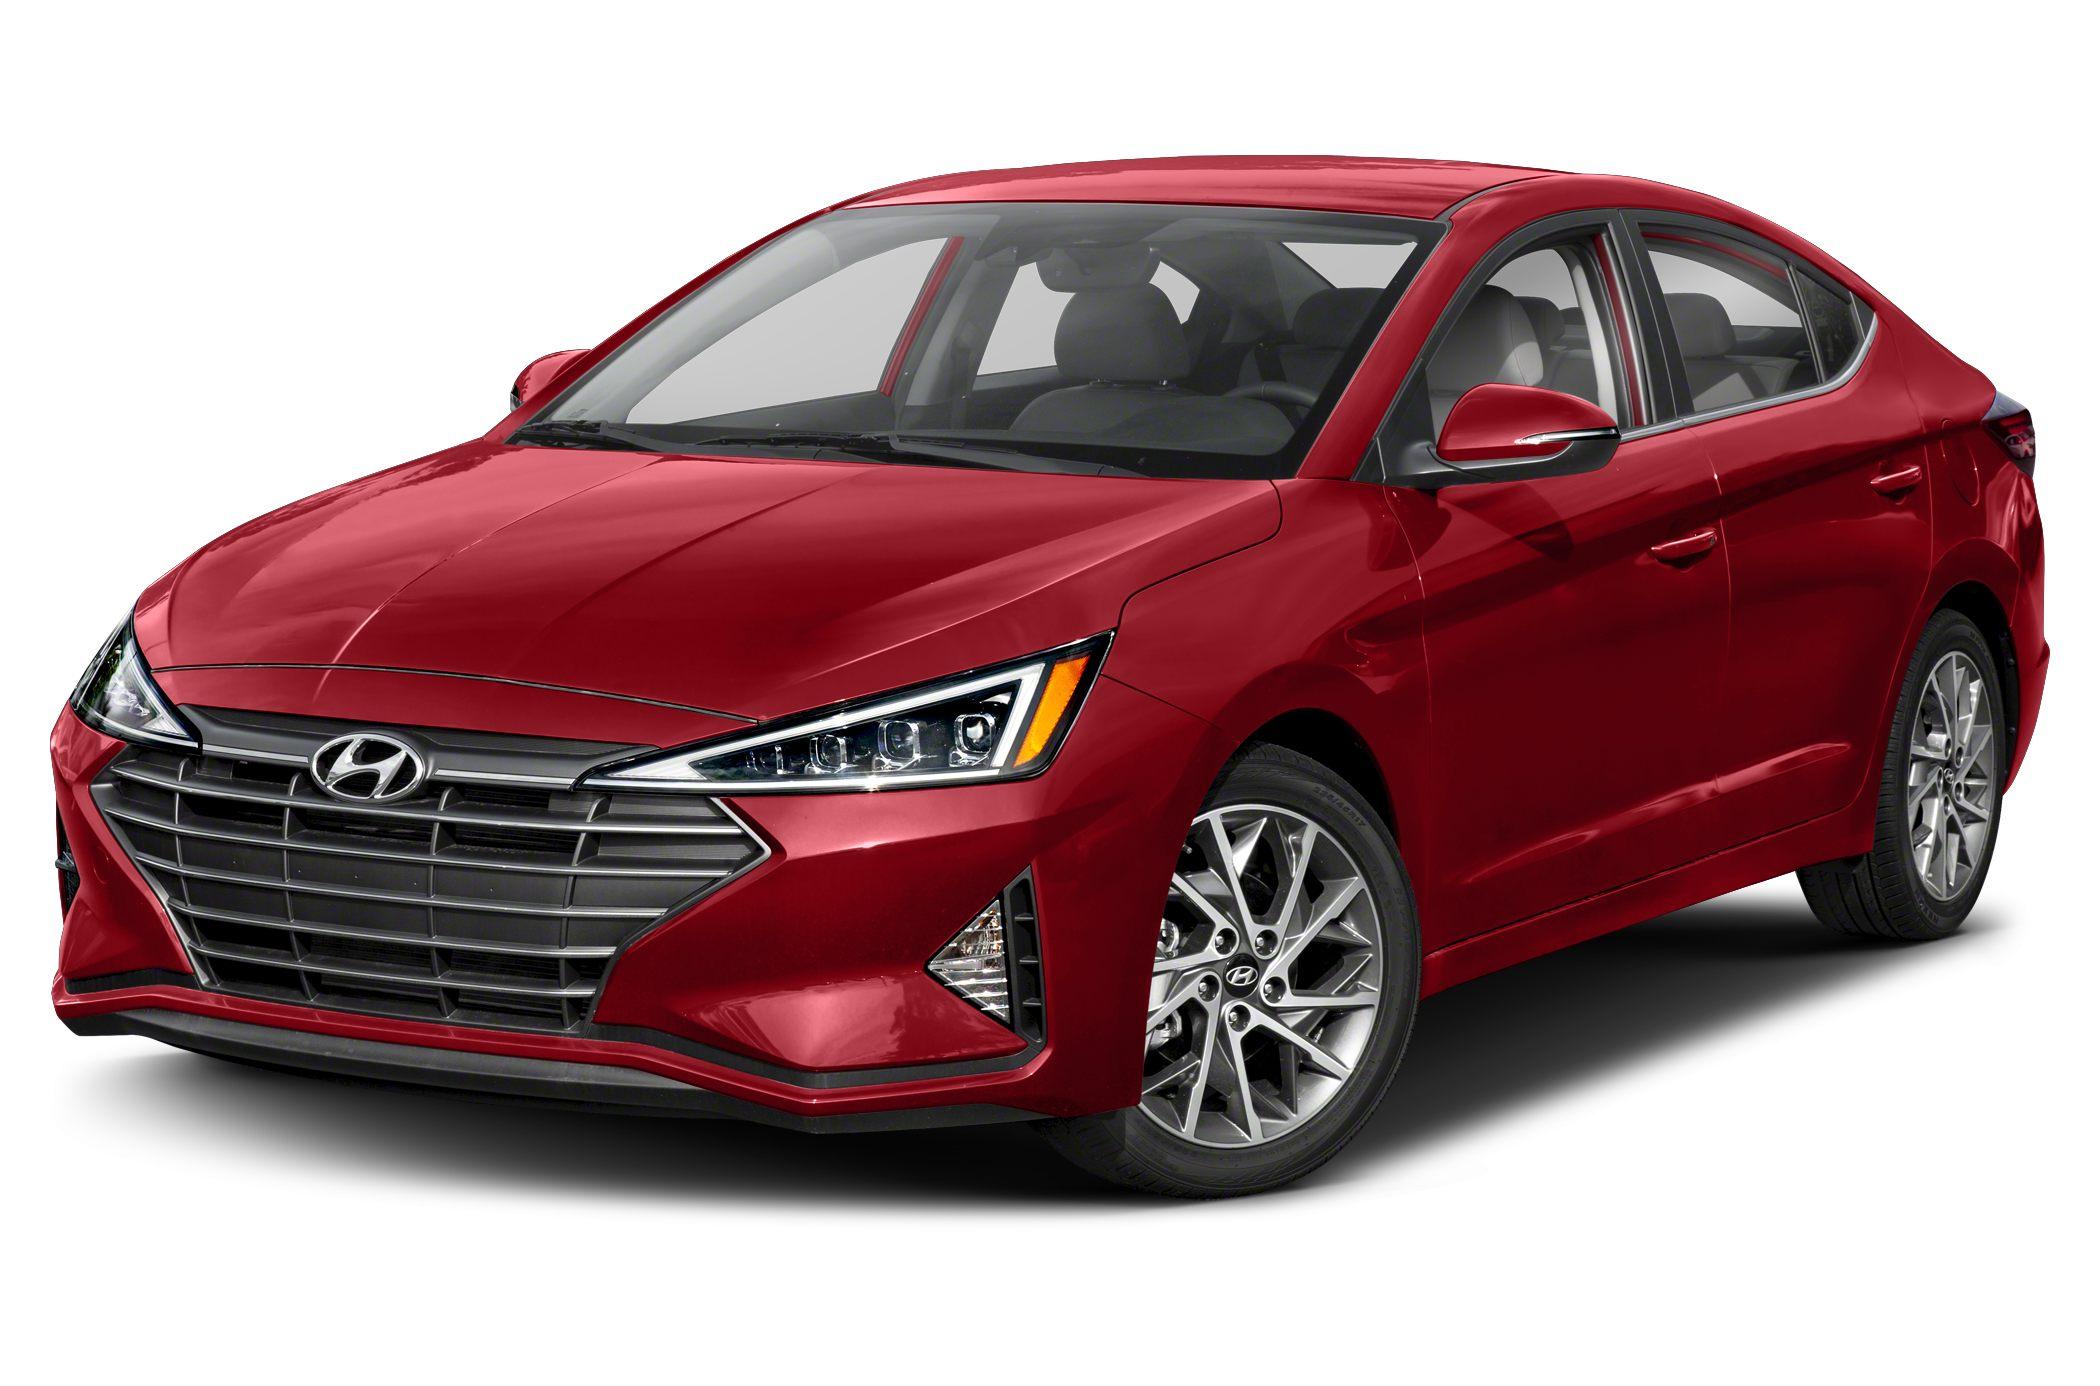 2020 Hyundai Elantra Limited 4dr Sedan